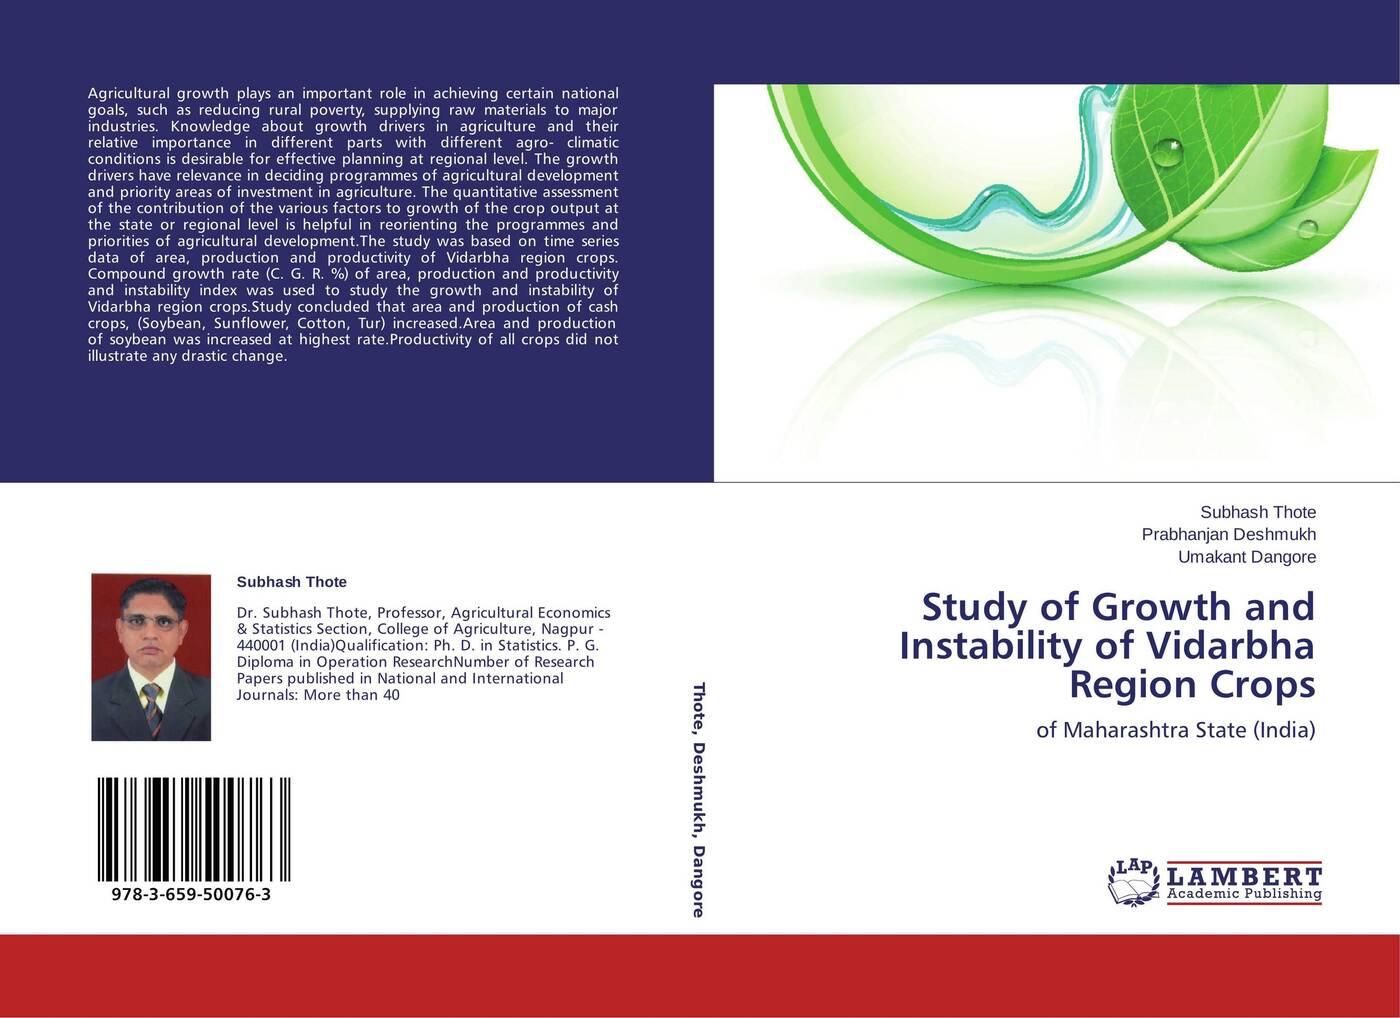 Subhash Thote,Prabhanjan Deshmukh and Umakant Dangore Study of Growth and Instability of Vidarbha Region Crops цена в Москве и Питере